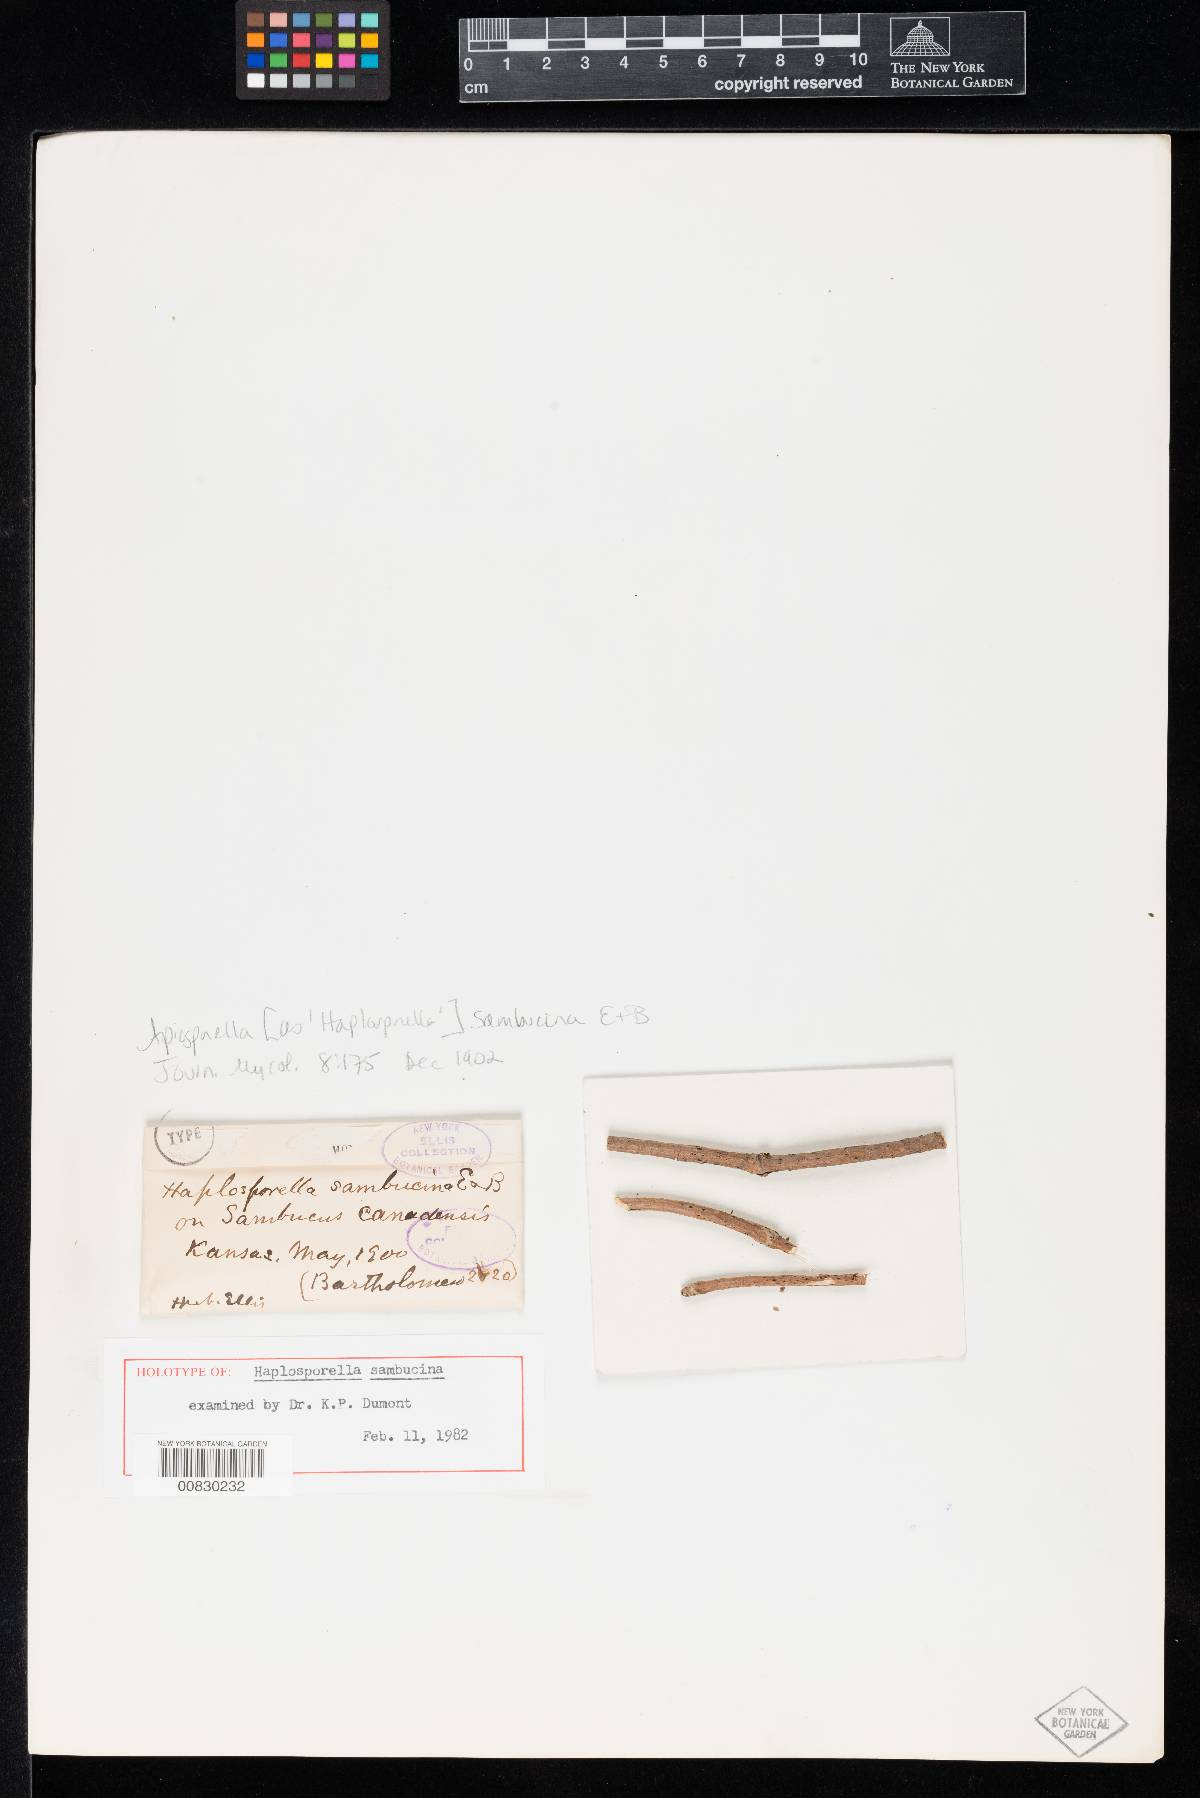 Aplosporella sambucina image